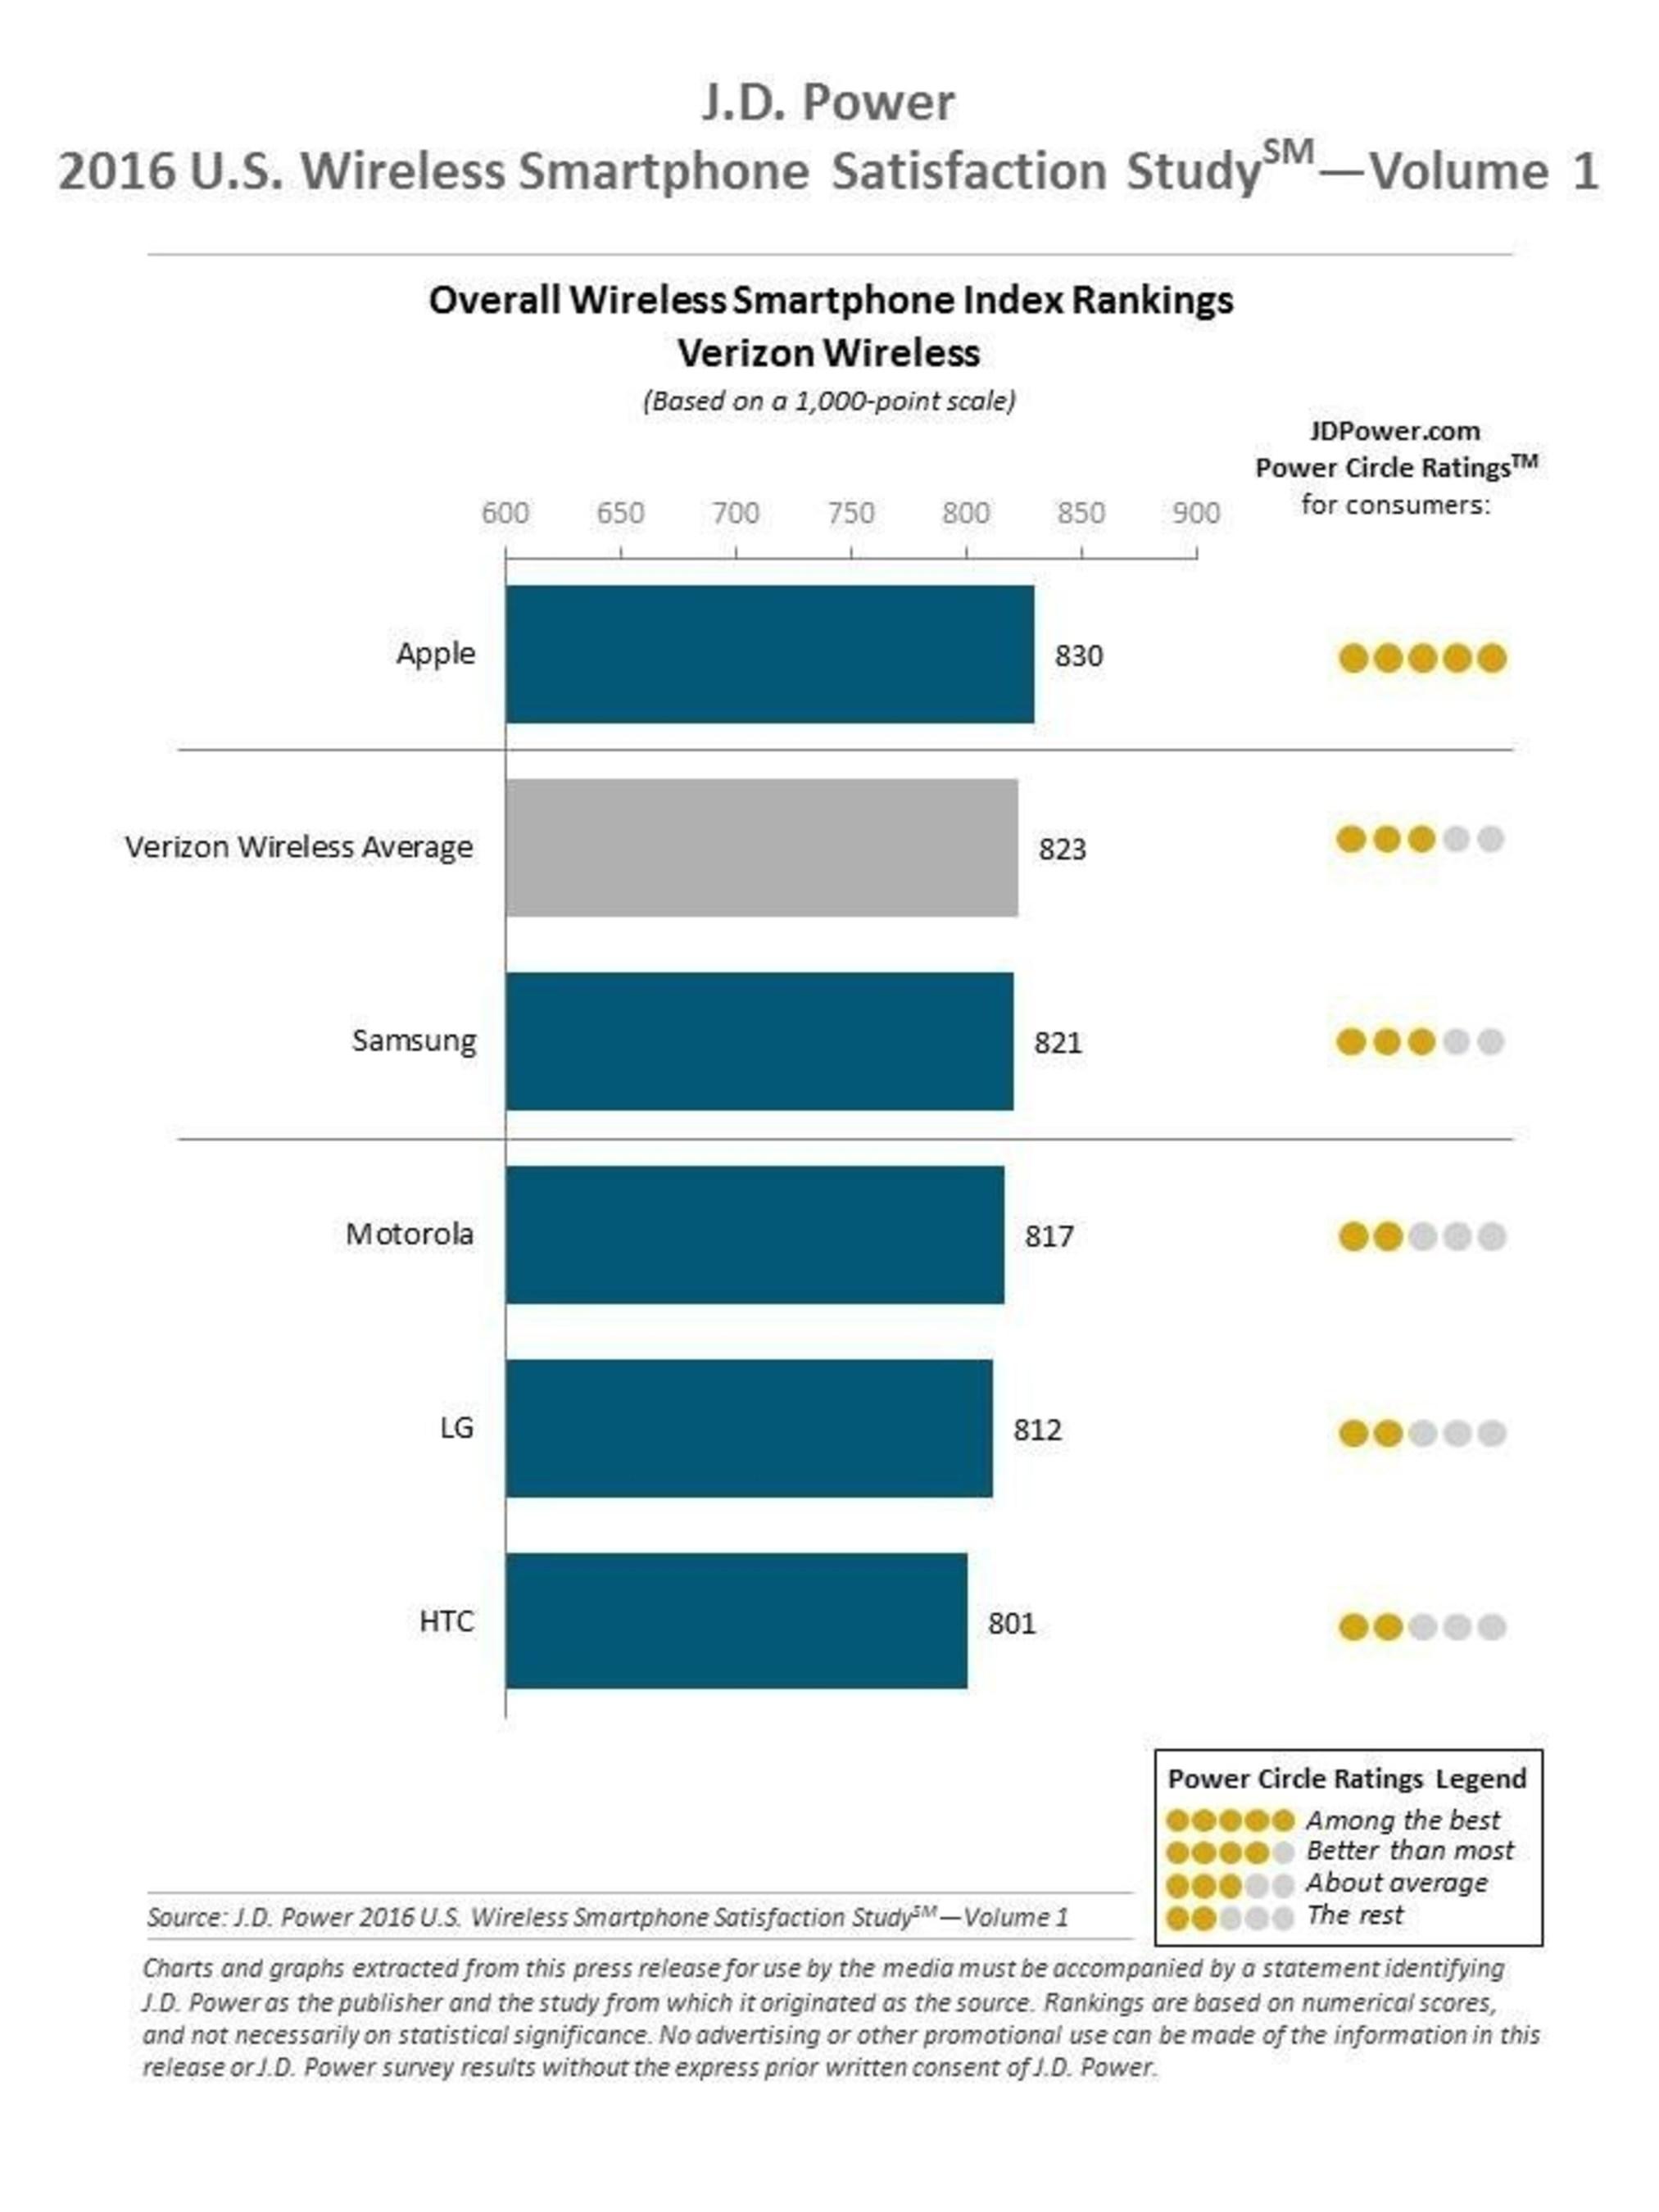 2016 J.D. Power Wireless Smartphone Ranking Verizon